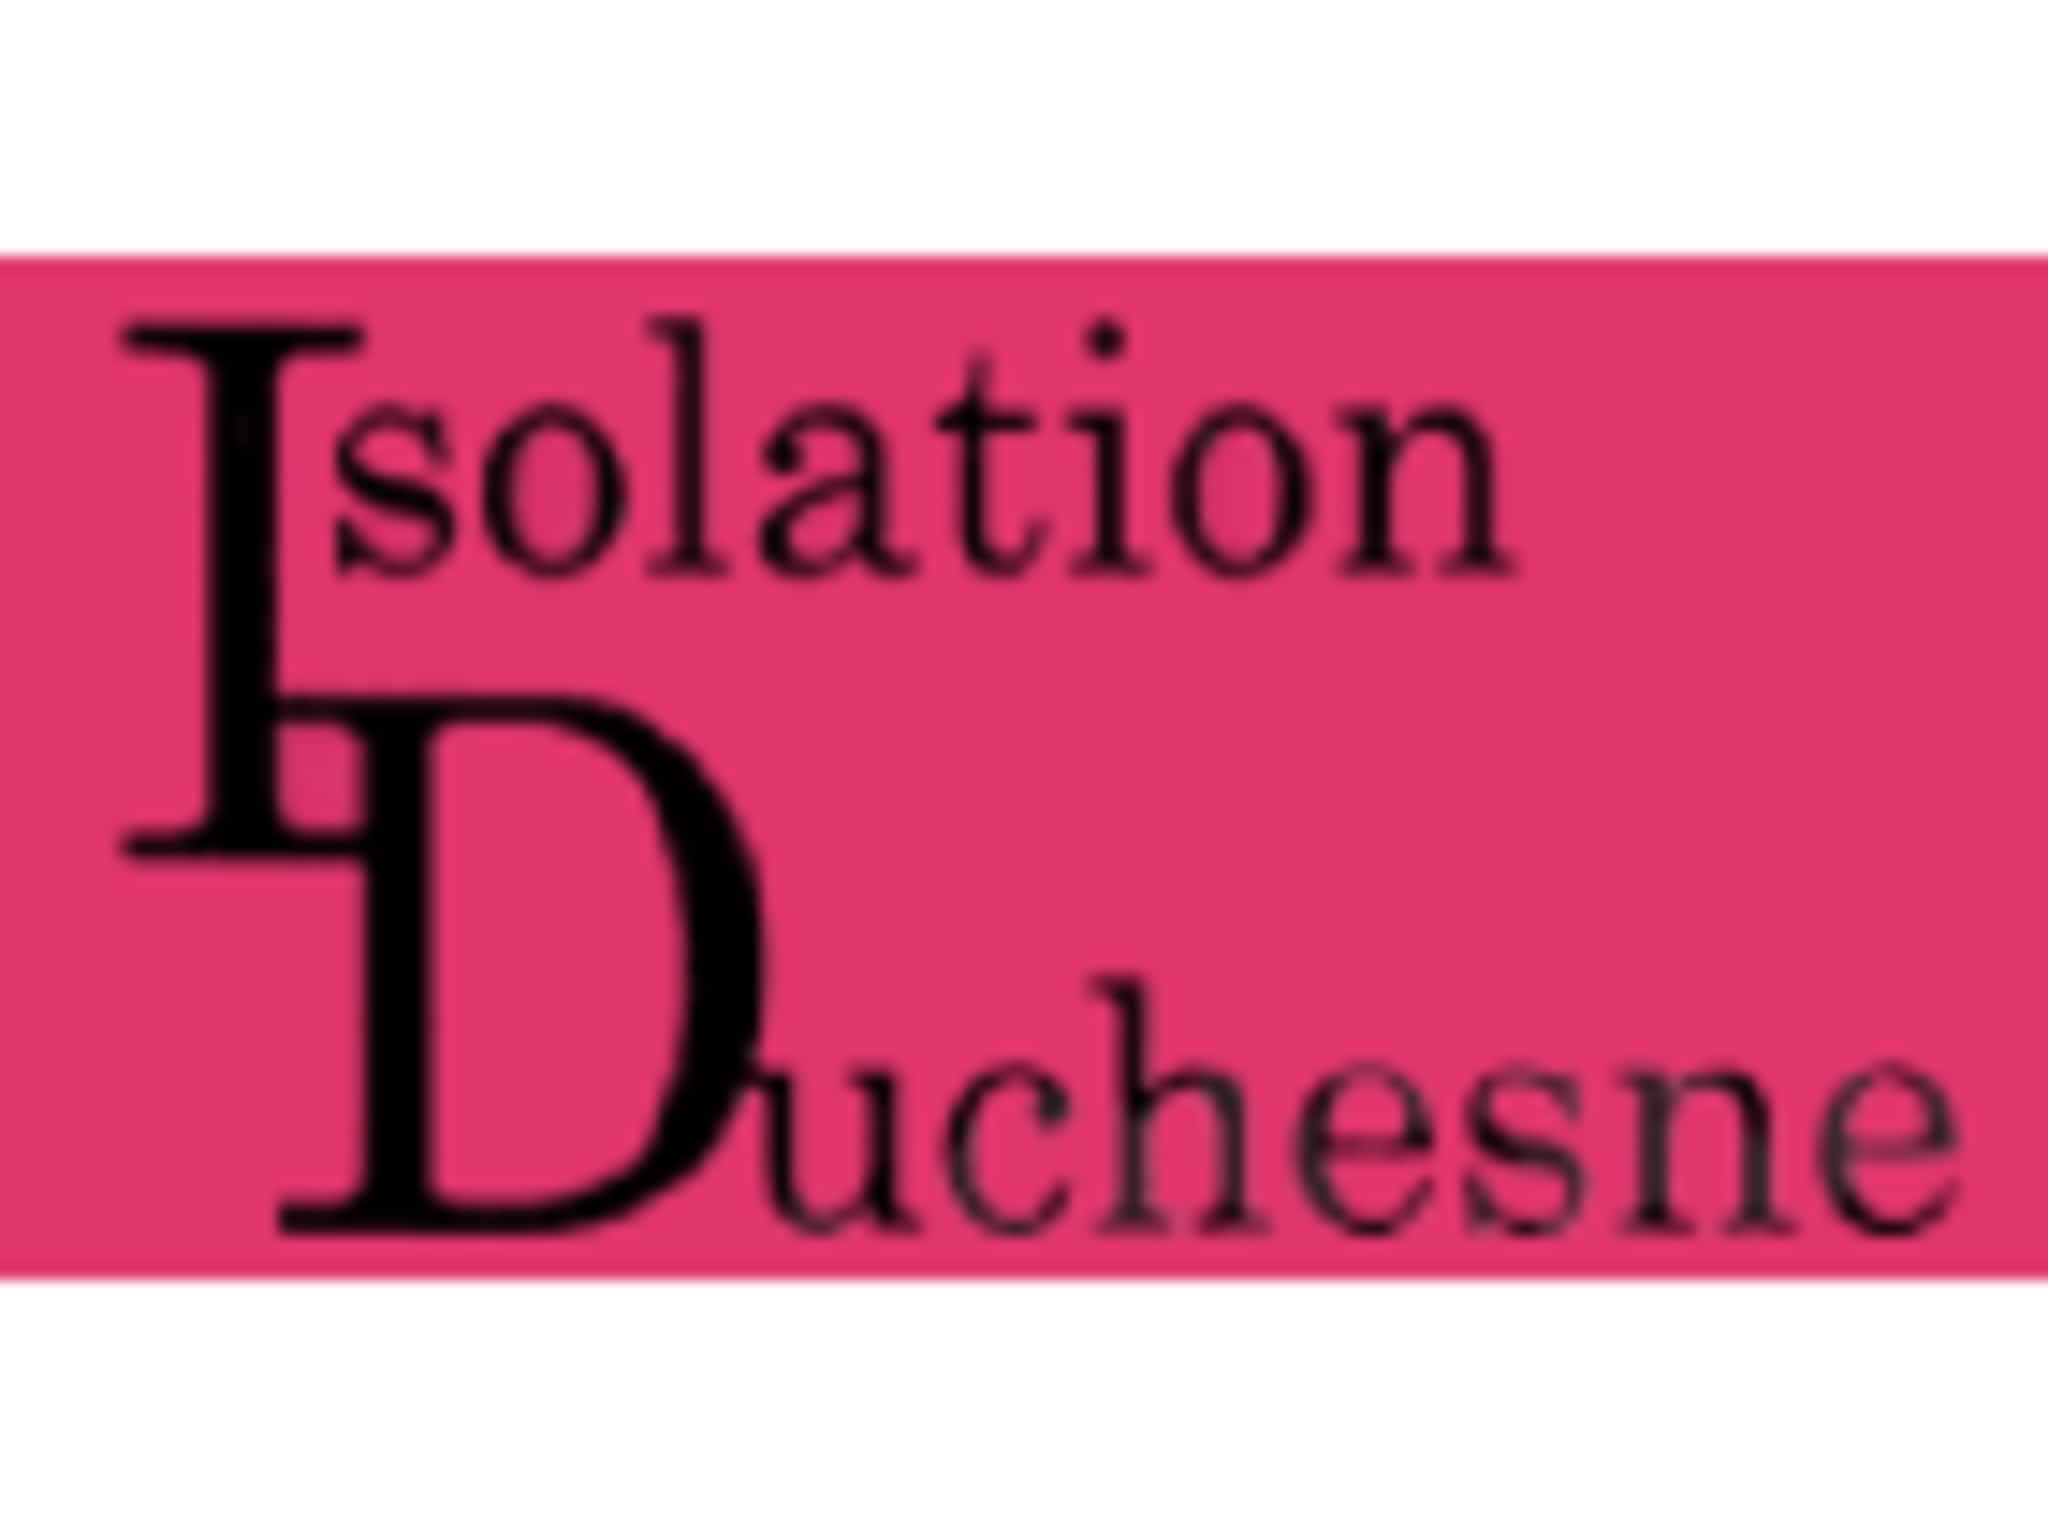 photo Isolation Duchesne